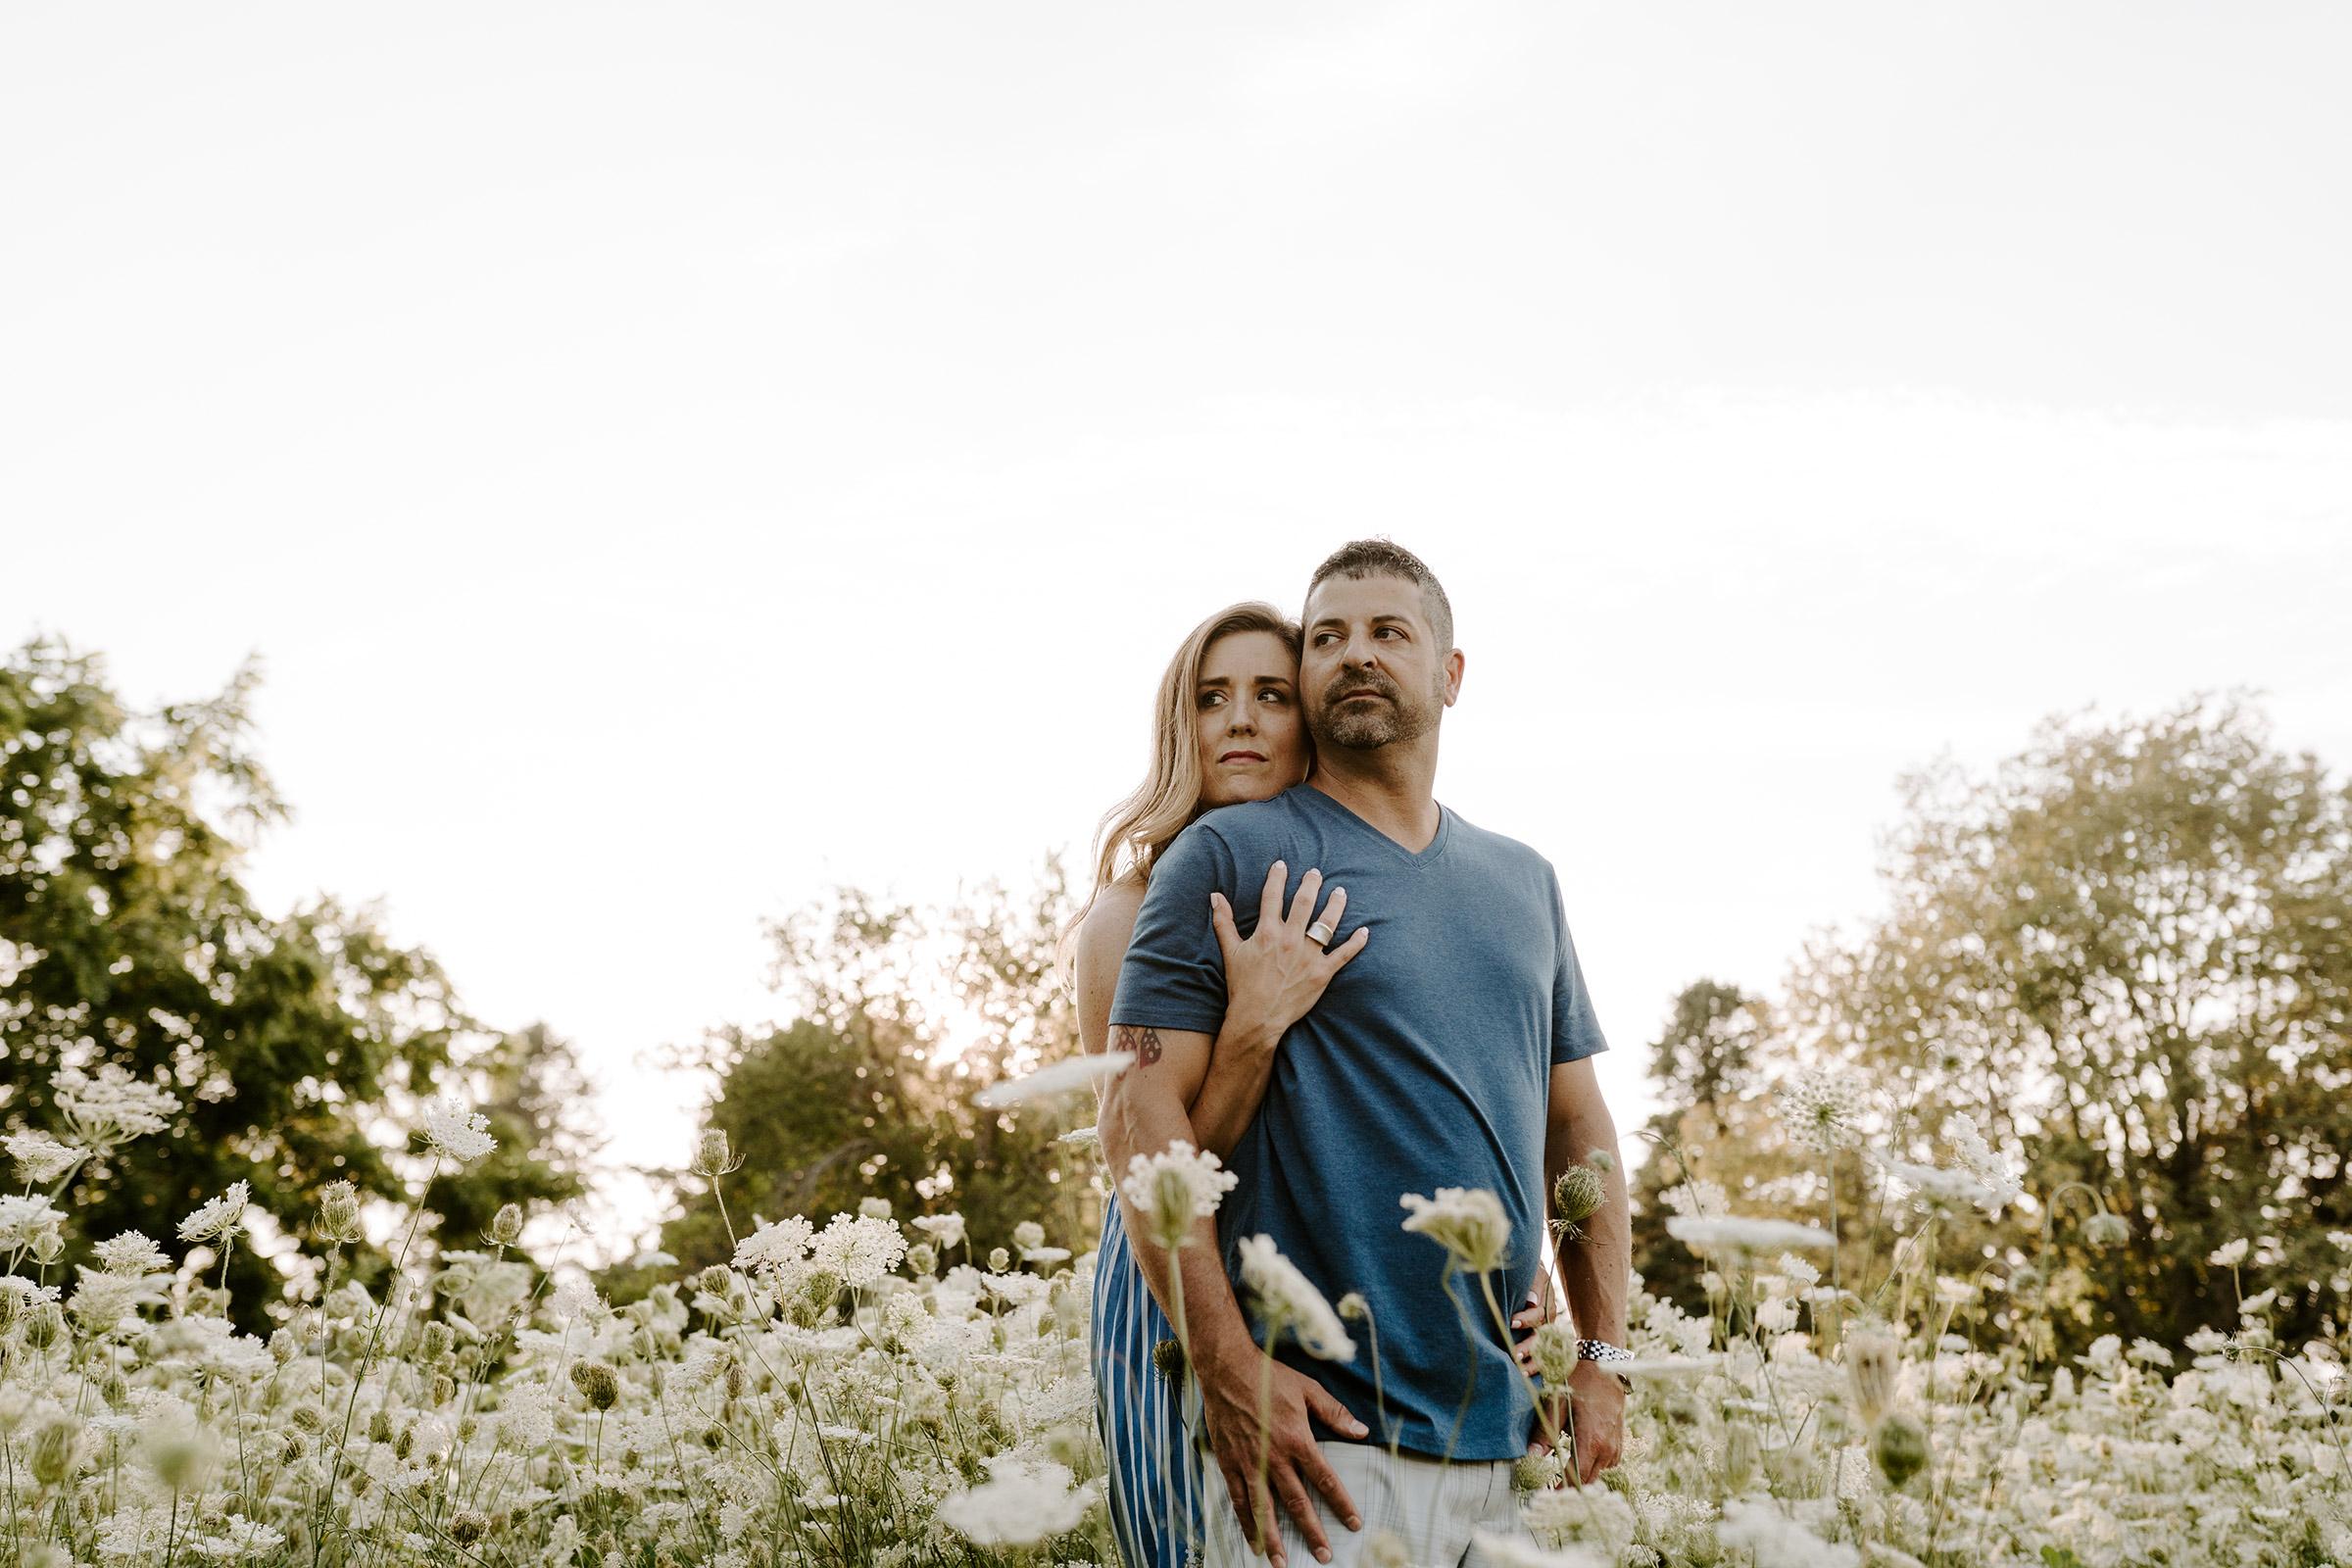 natale-family-mom-dad-standing-together-iris-aisle--winterset-iowa-raelyn-ramey-photography-135.jpg